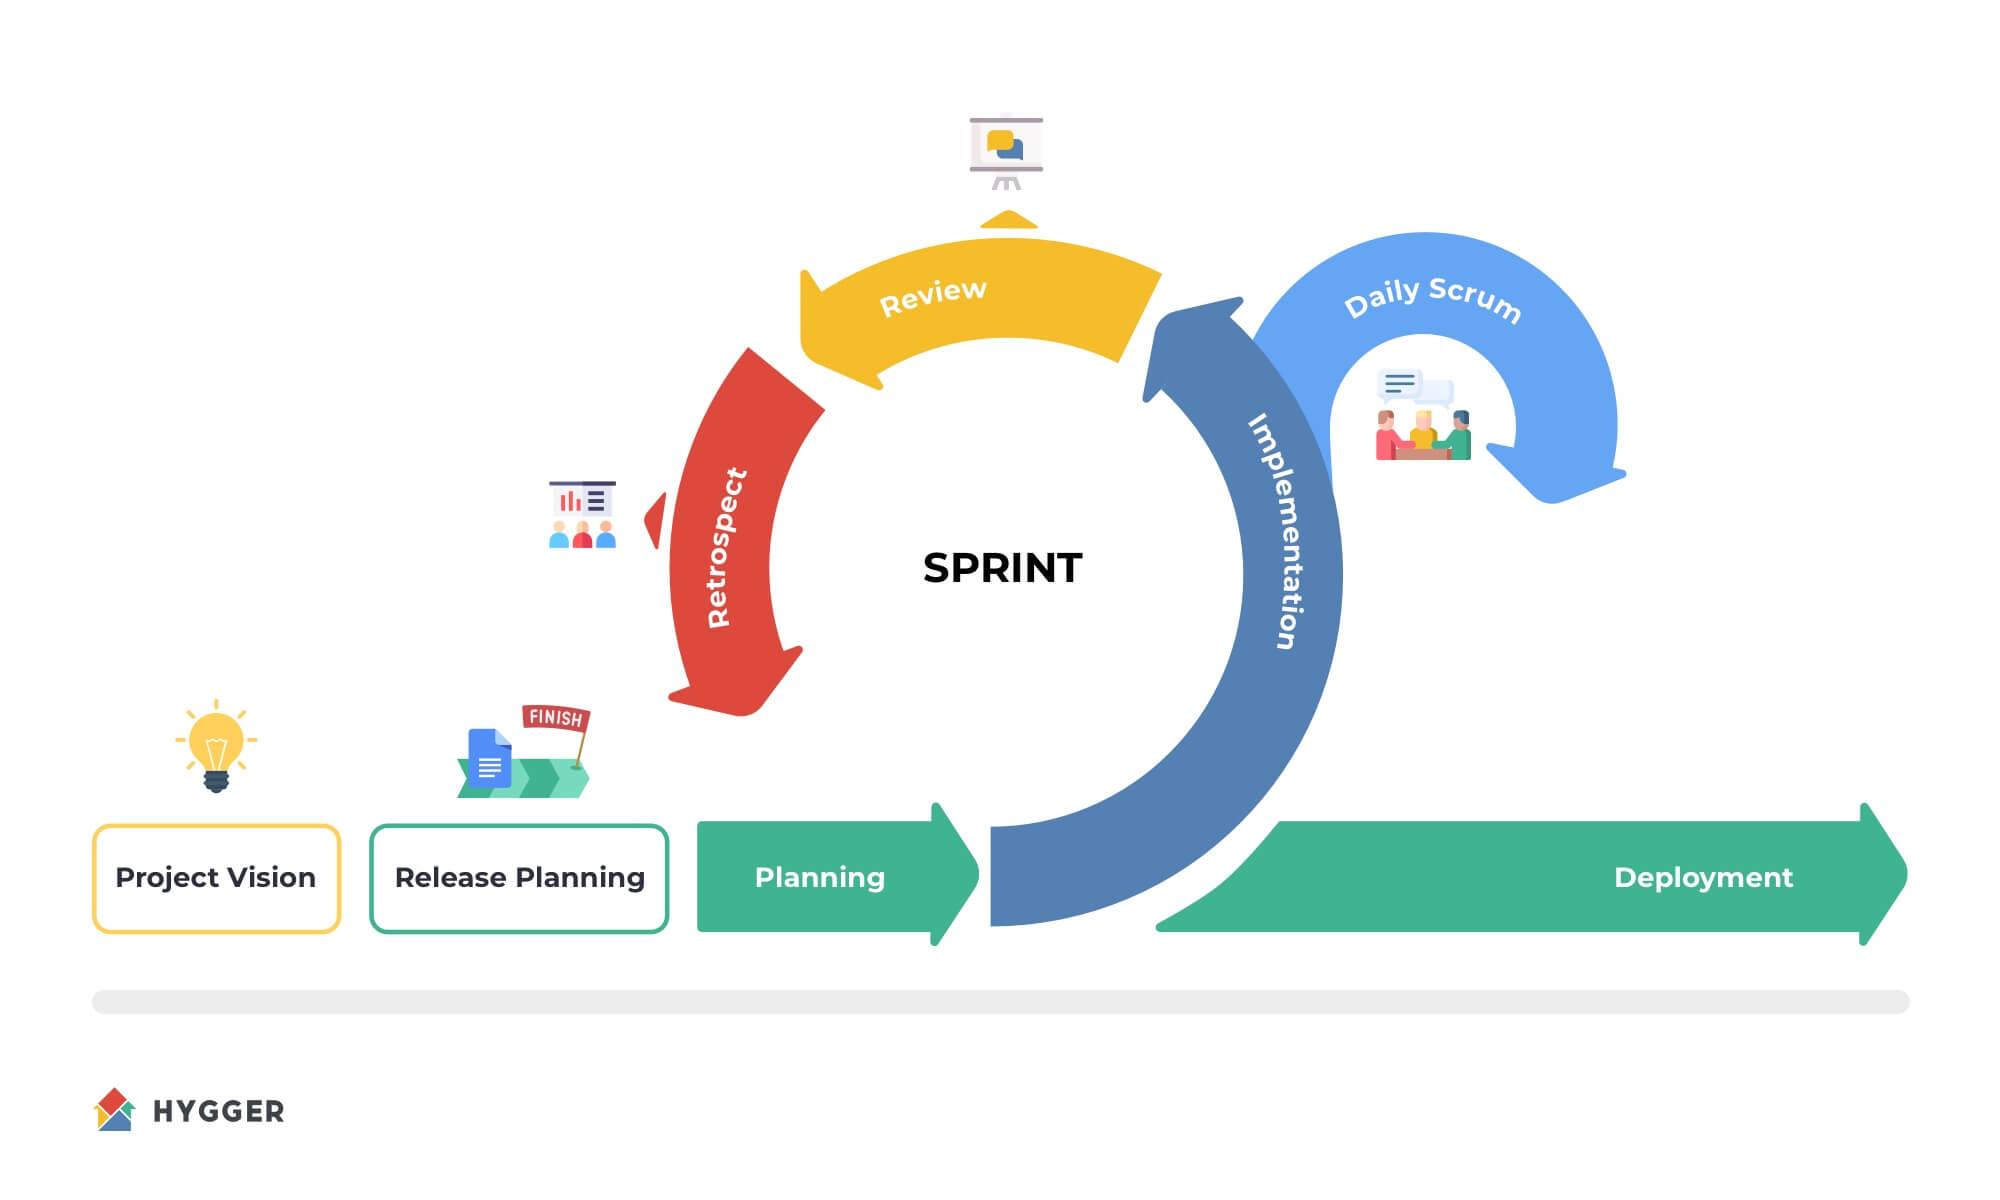 Sprint meetings review